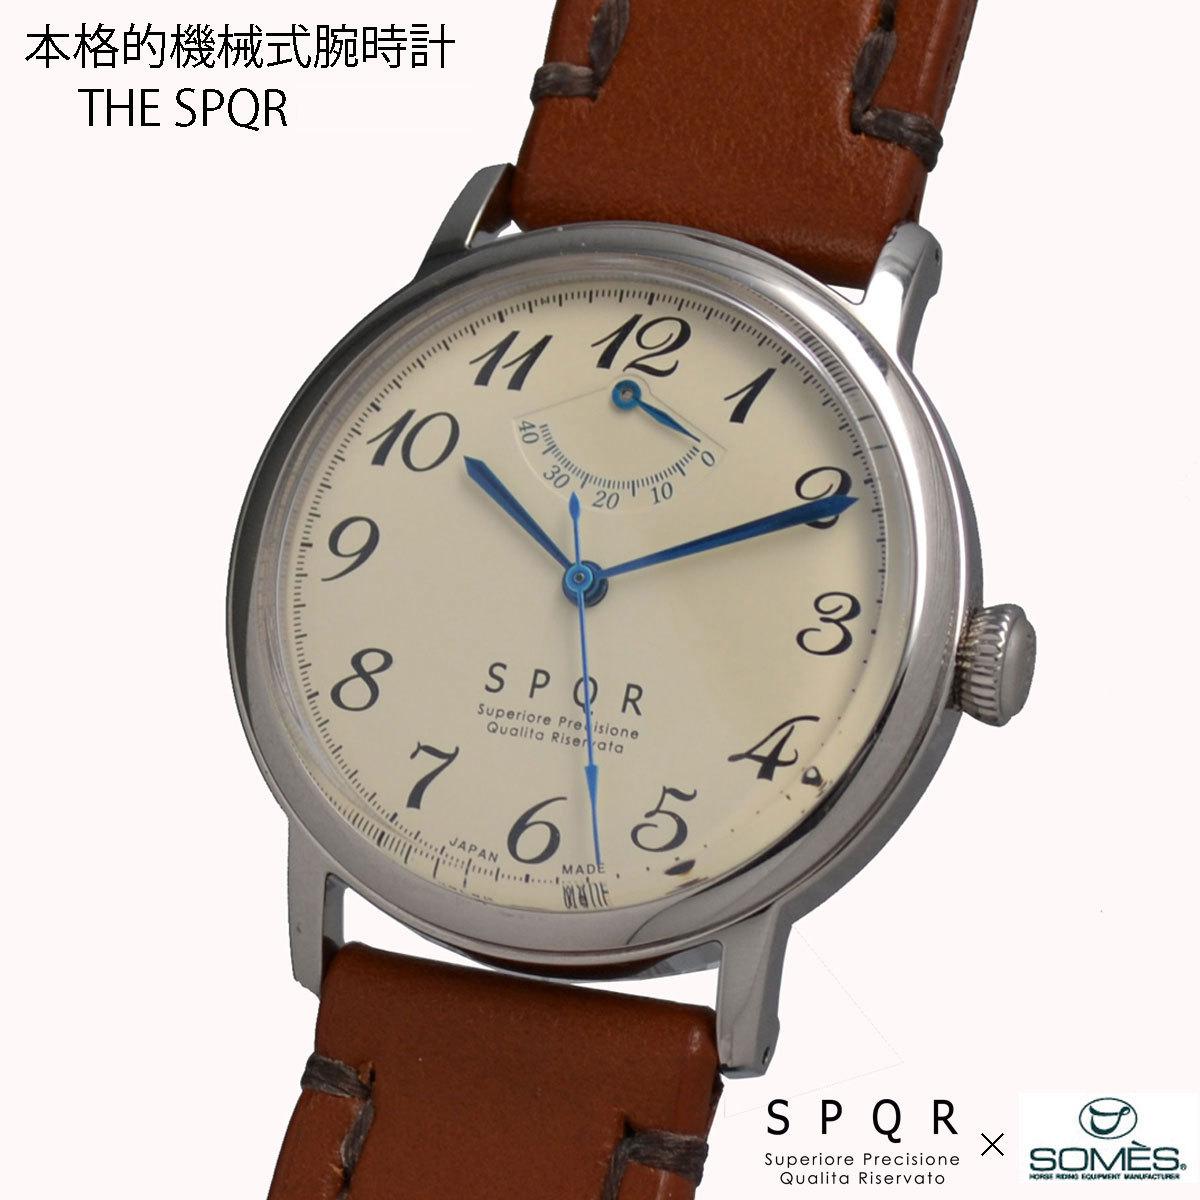 THE SPQR 手巻パワーリザーブ(アイボリー)×日本で唯一の馬具メーカーSOMESの職人がハンドメイドで仕上げた渾身の4mm厚時計バンド 手巻き ウォッチ 日本製 国産時計 腕時計